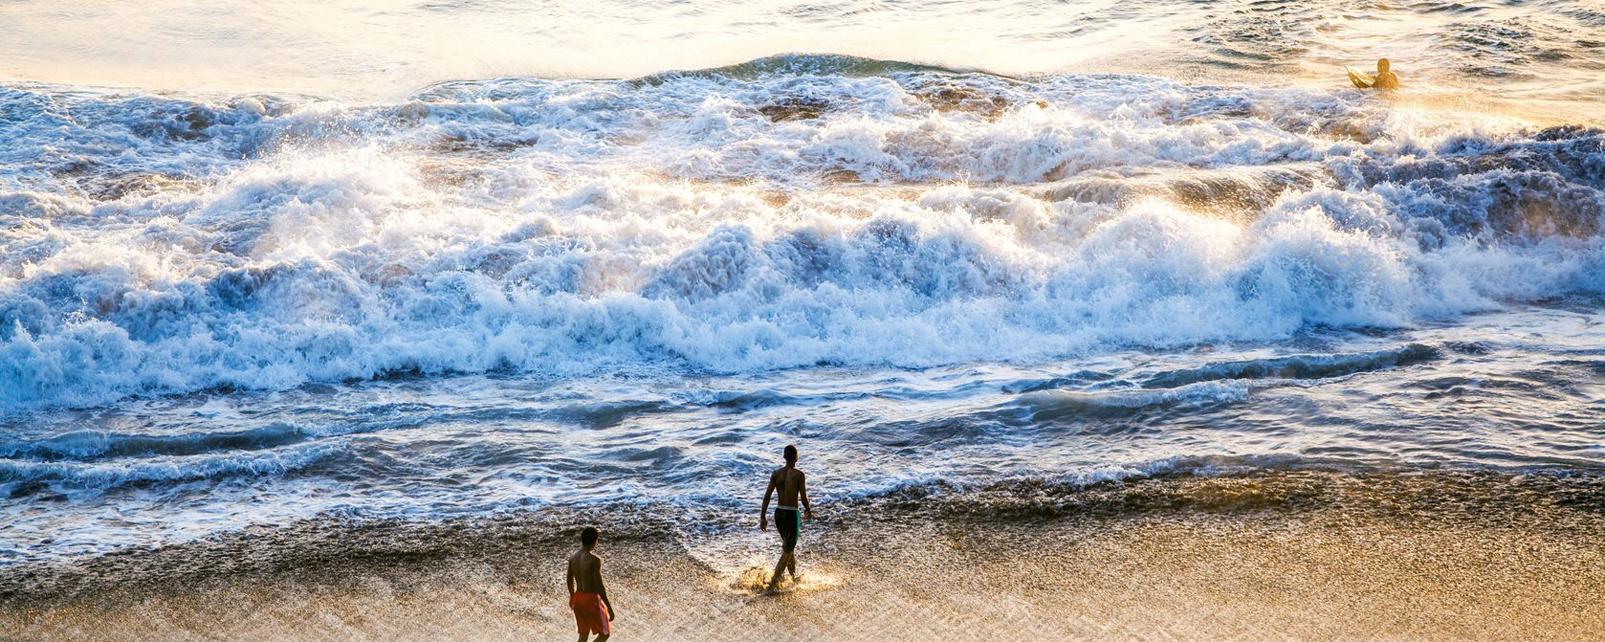 Afrique; Cap-Vert; Praia; plage; homme; baignade; mer; océan; sable;